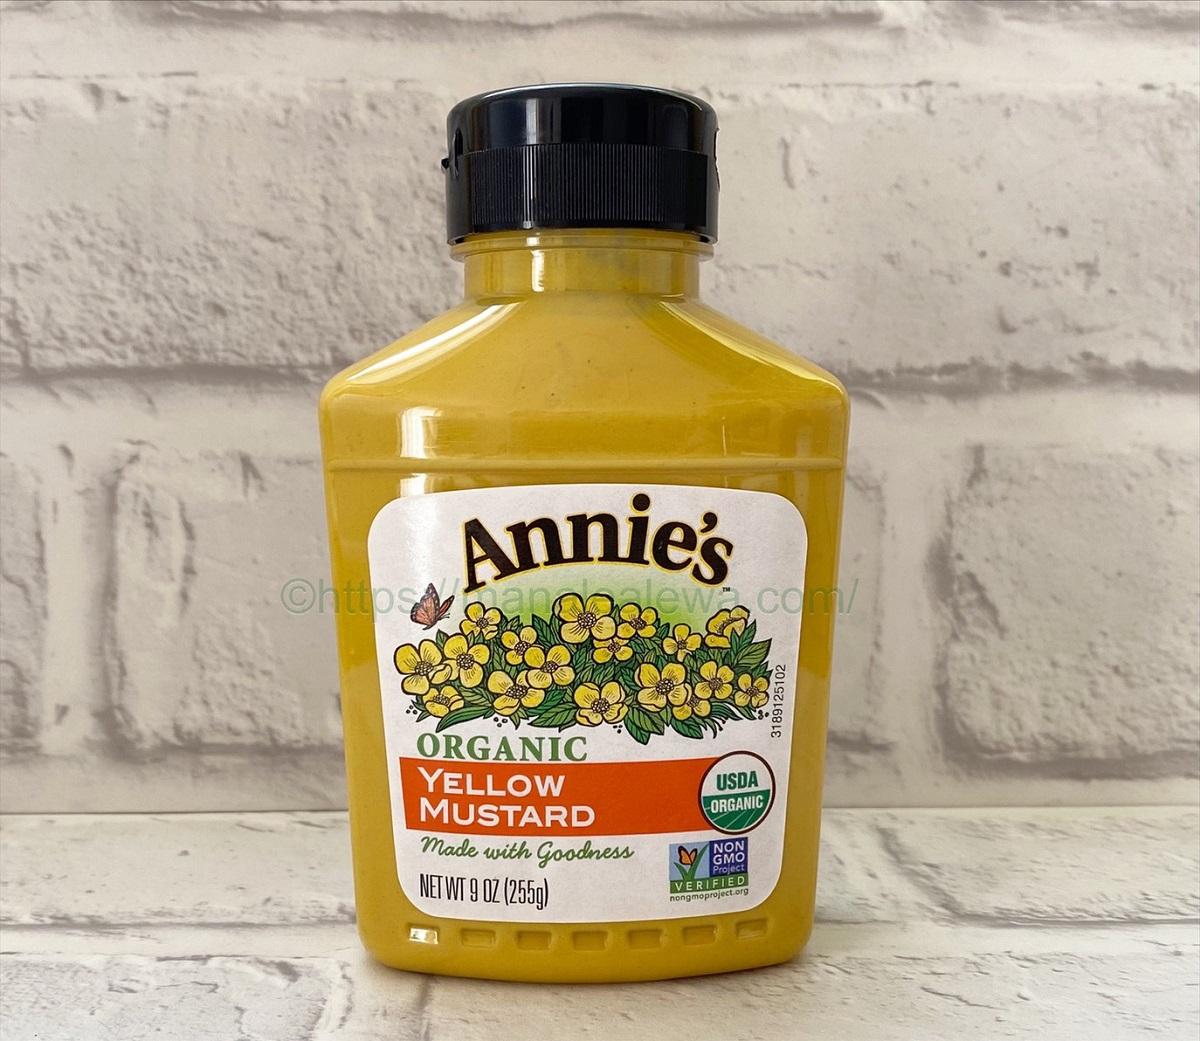 Annies-Naturals-organic-yellow-mustard